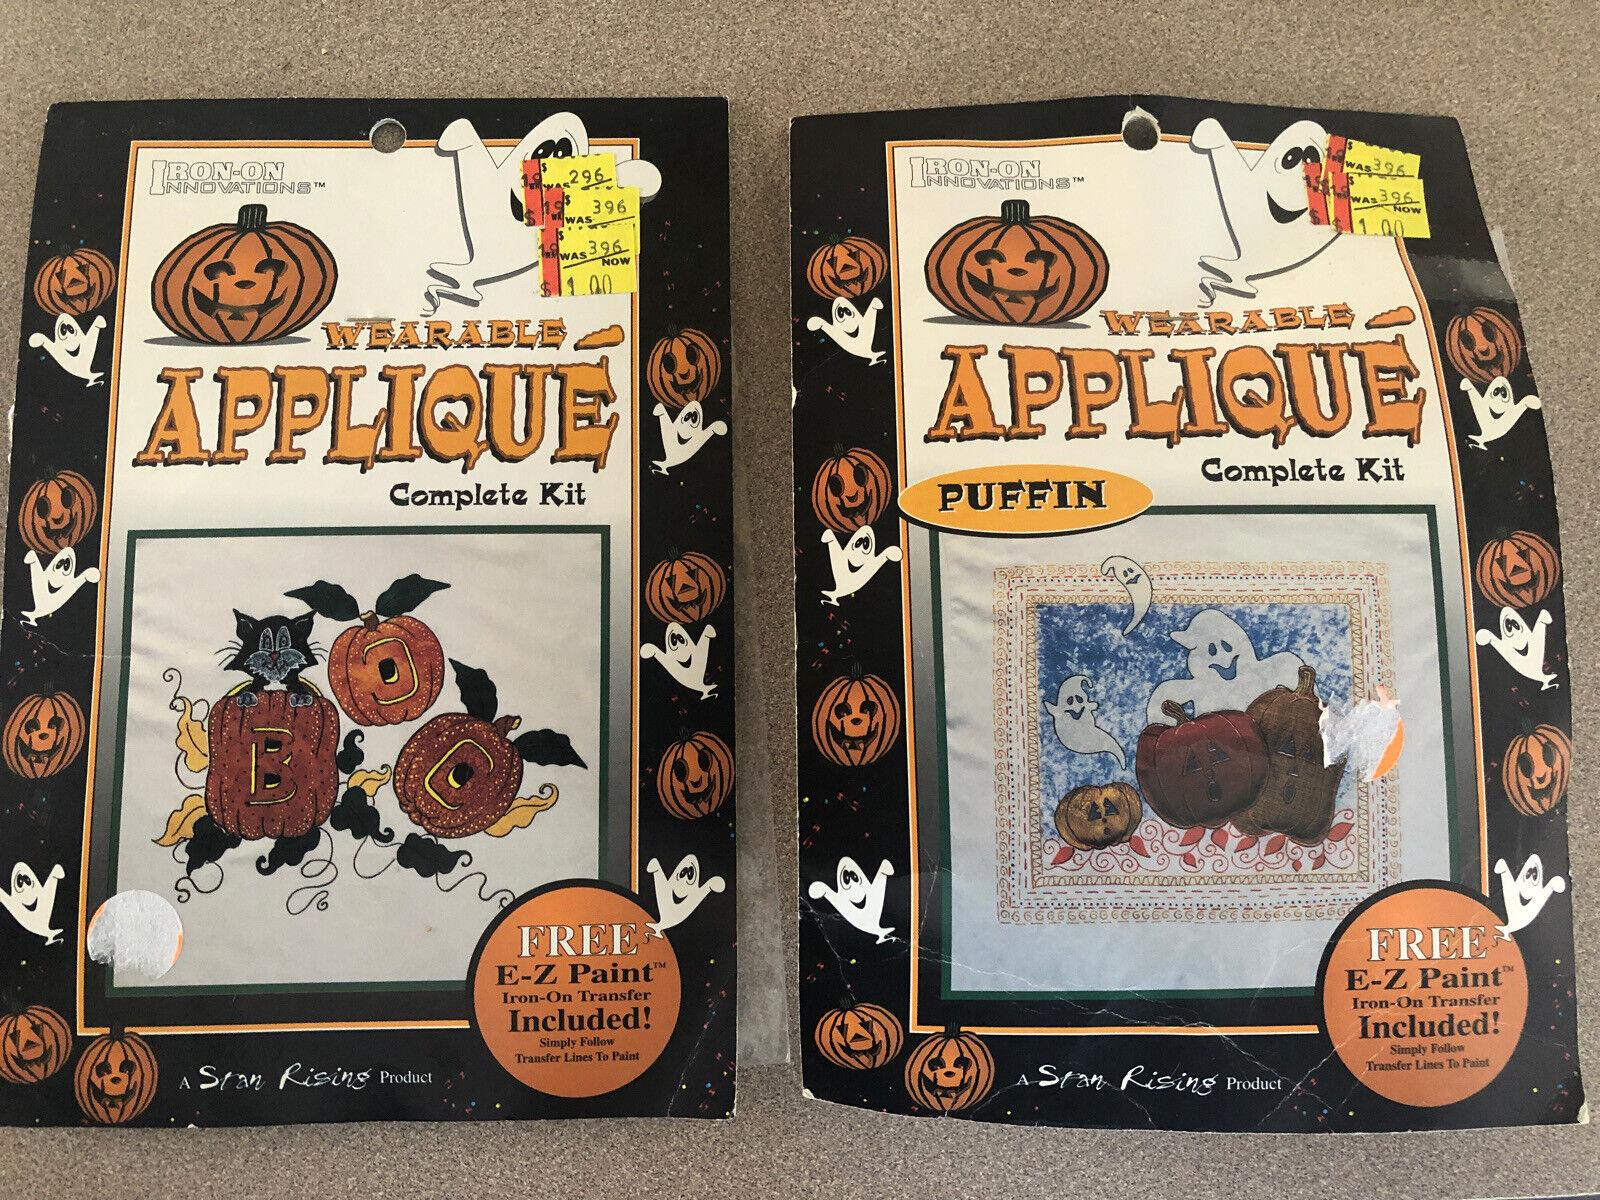 Vintage Iron On Kit Halloween Appliqué Kit Lot Of 2 Pumpkins Puffin Stan Rising